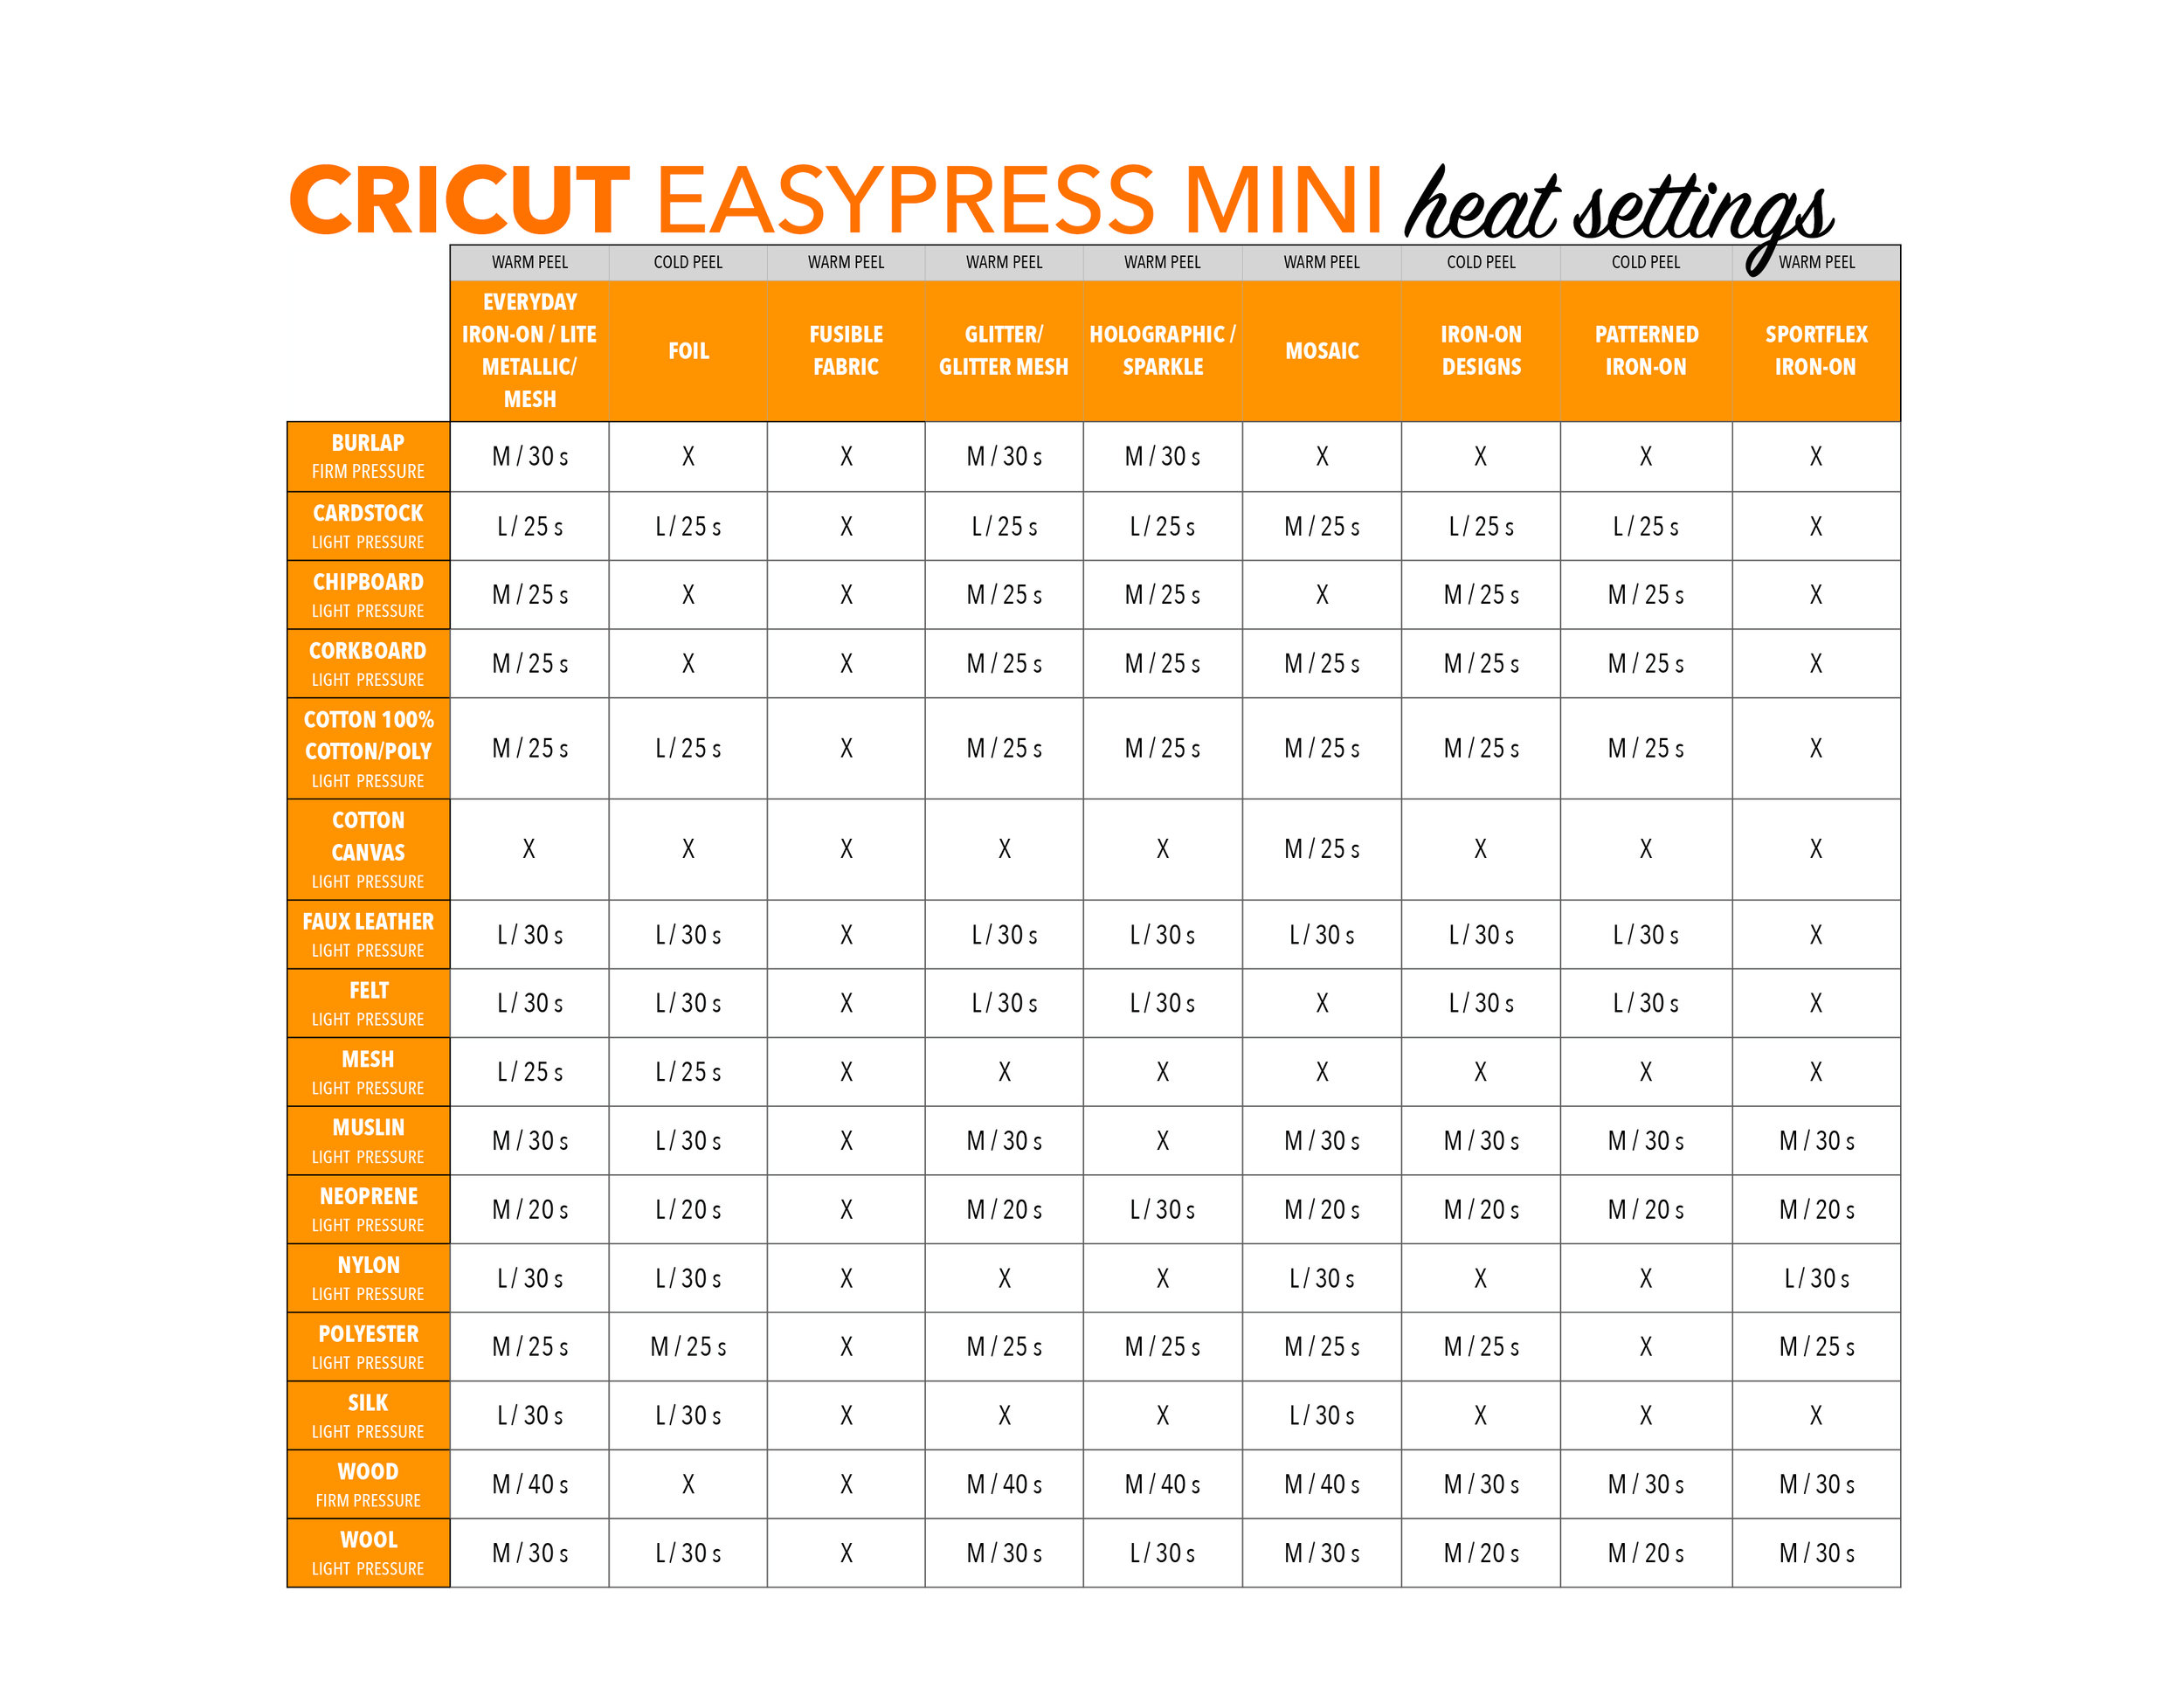 MINIcricut-easypress-heat-setting.jpg